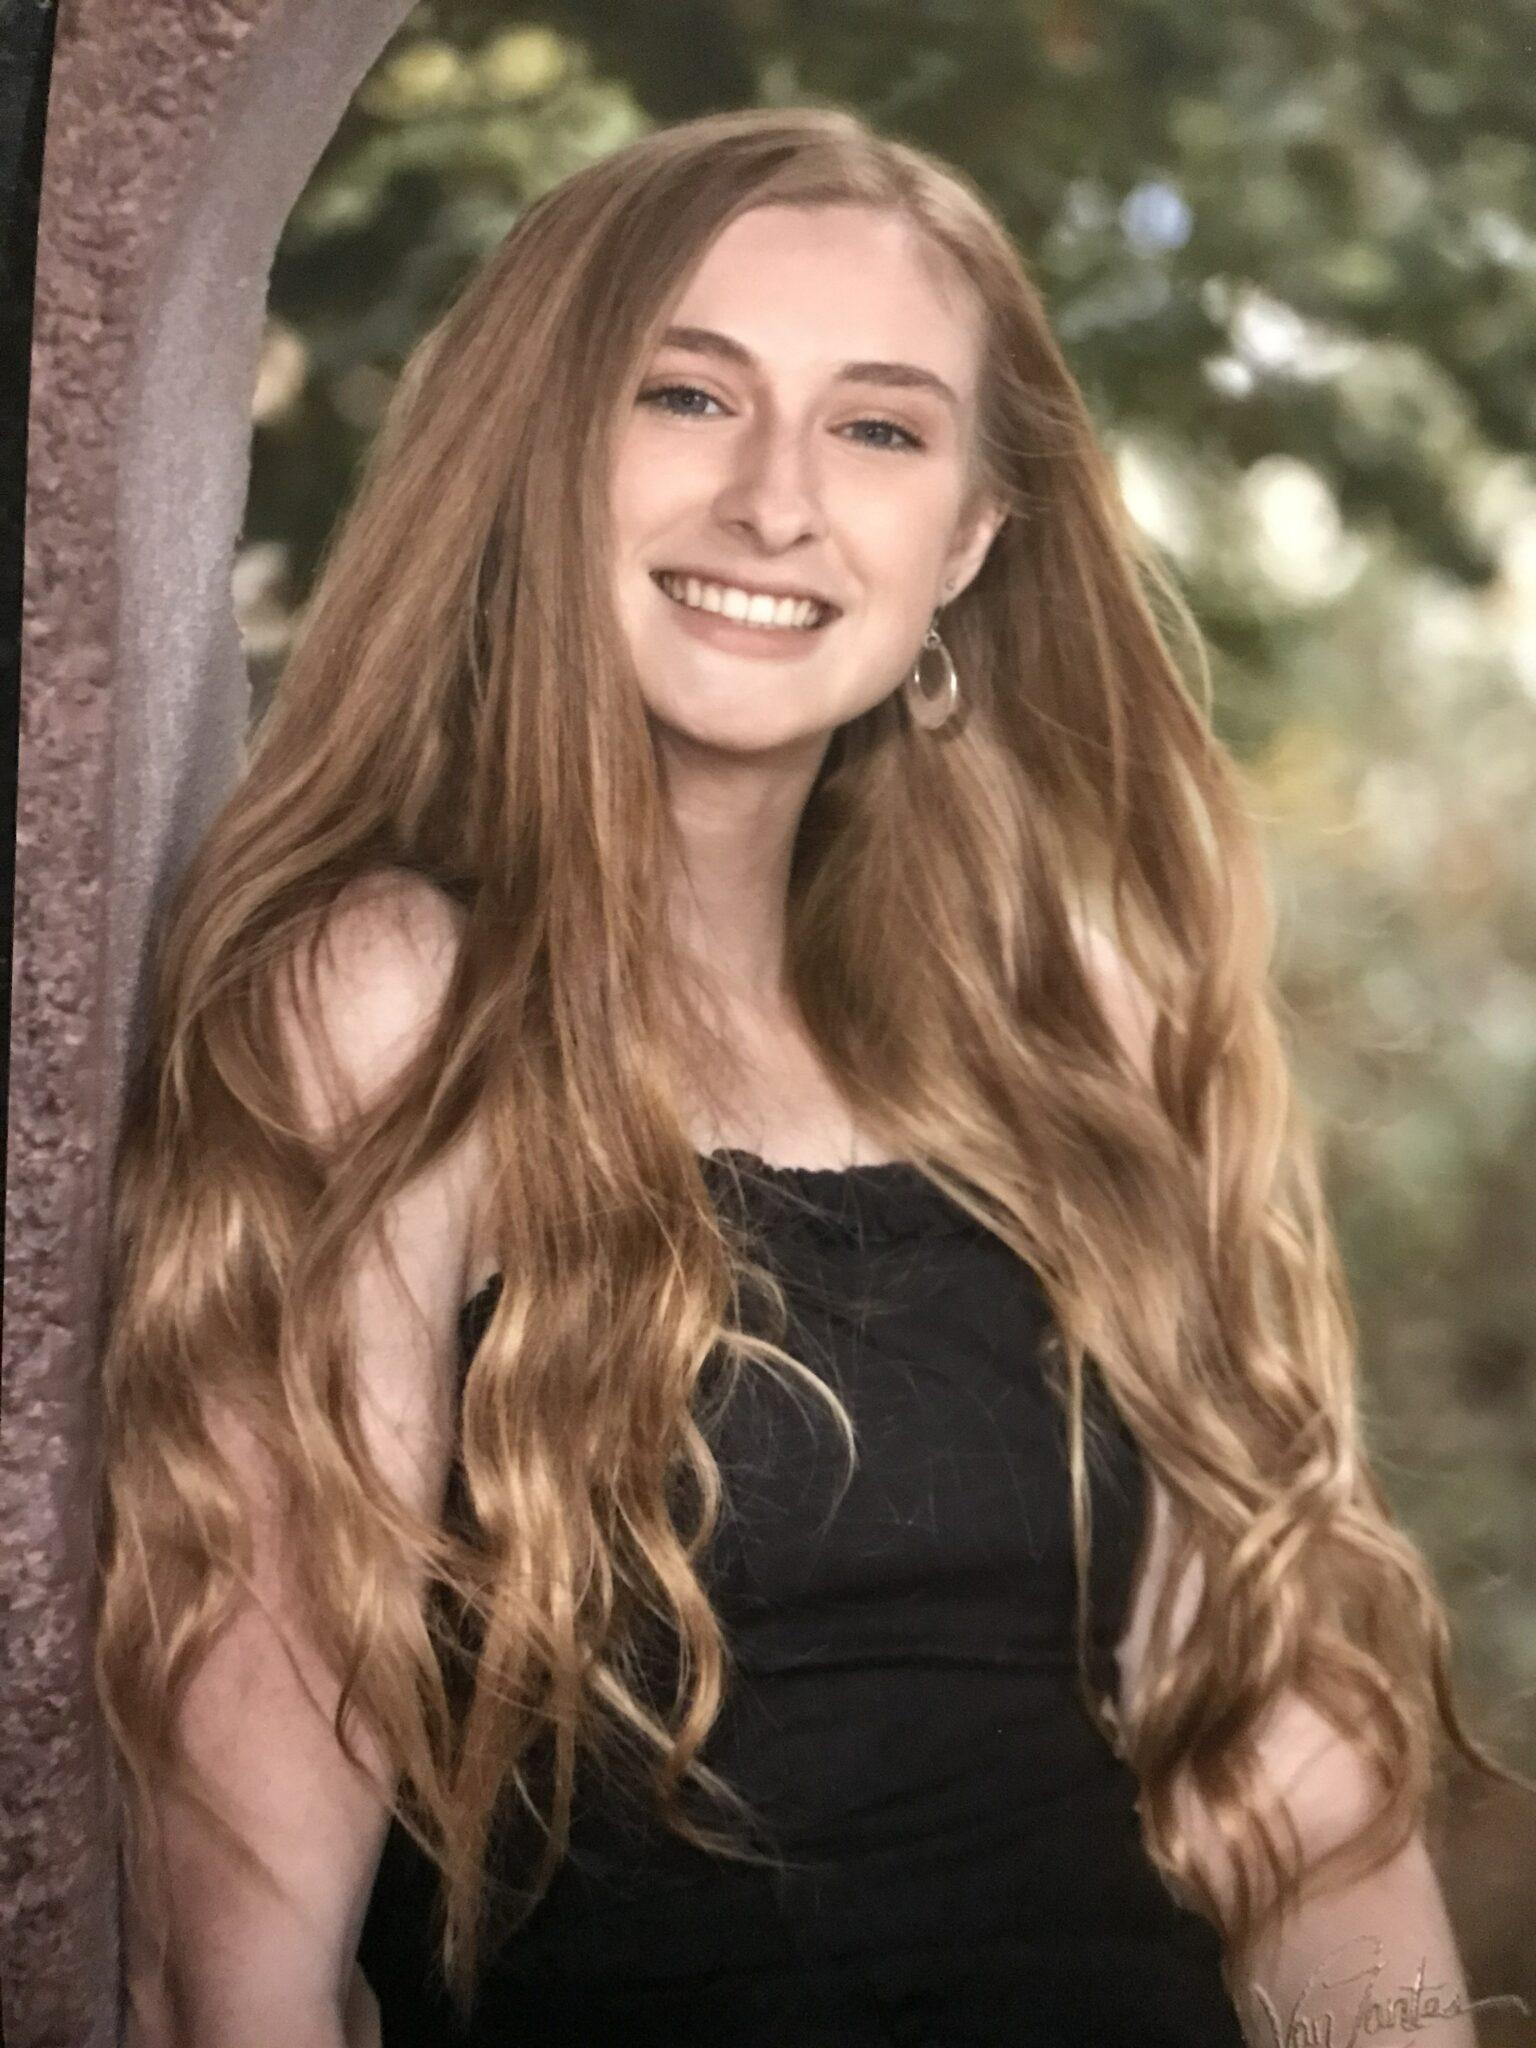 Senior Spotlight: Olivia Lapioli